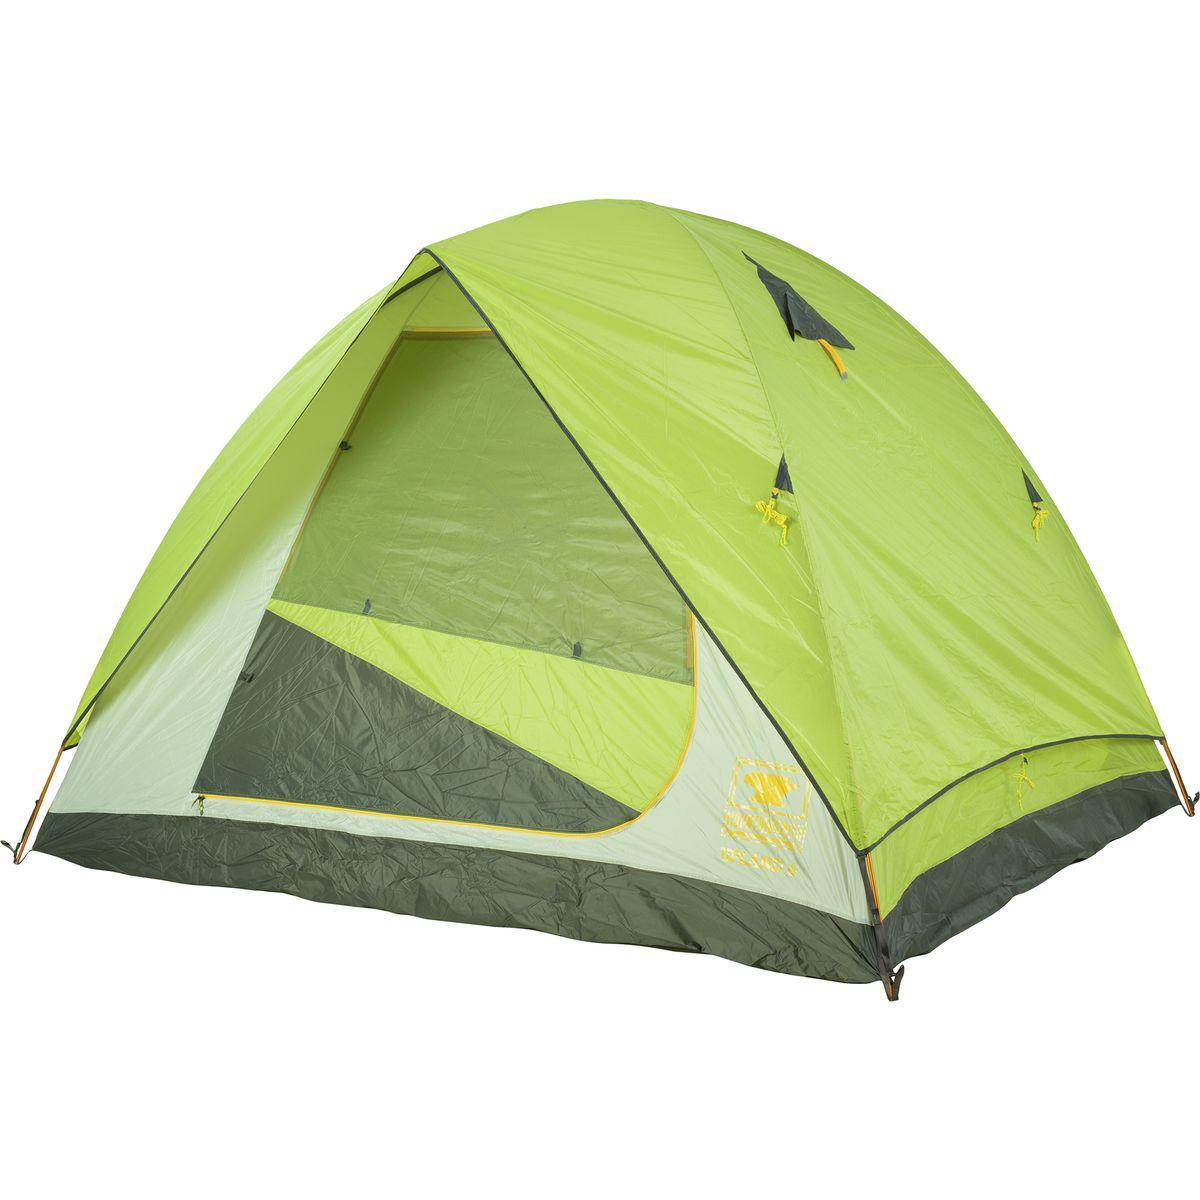 Mountainsmith Upland Tent: 6-Person 3-Season Citron Green, One Size